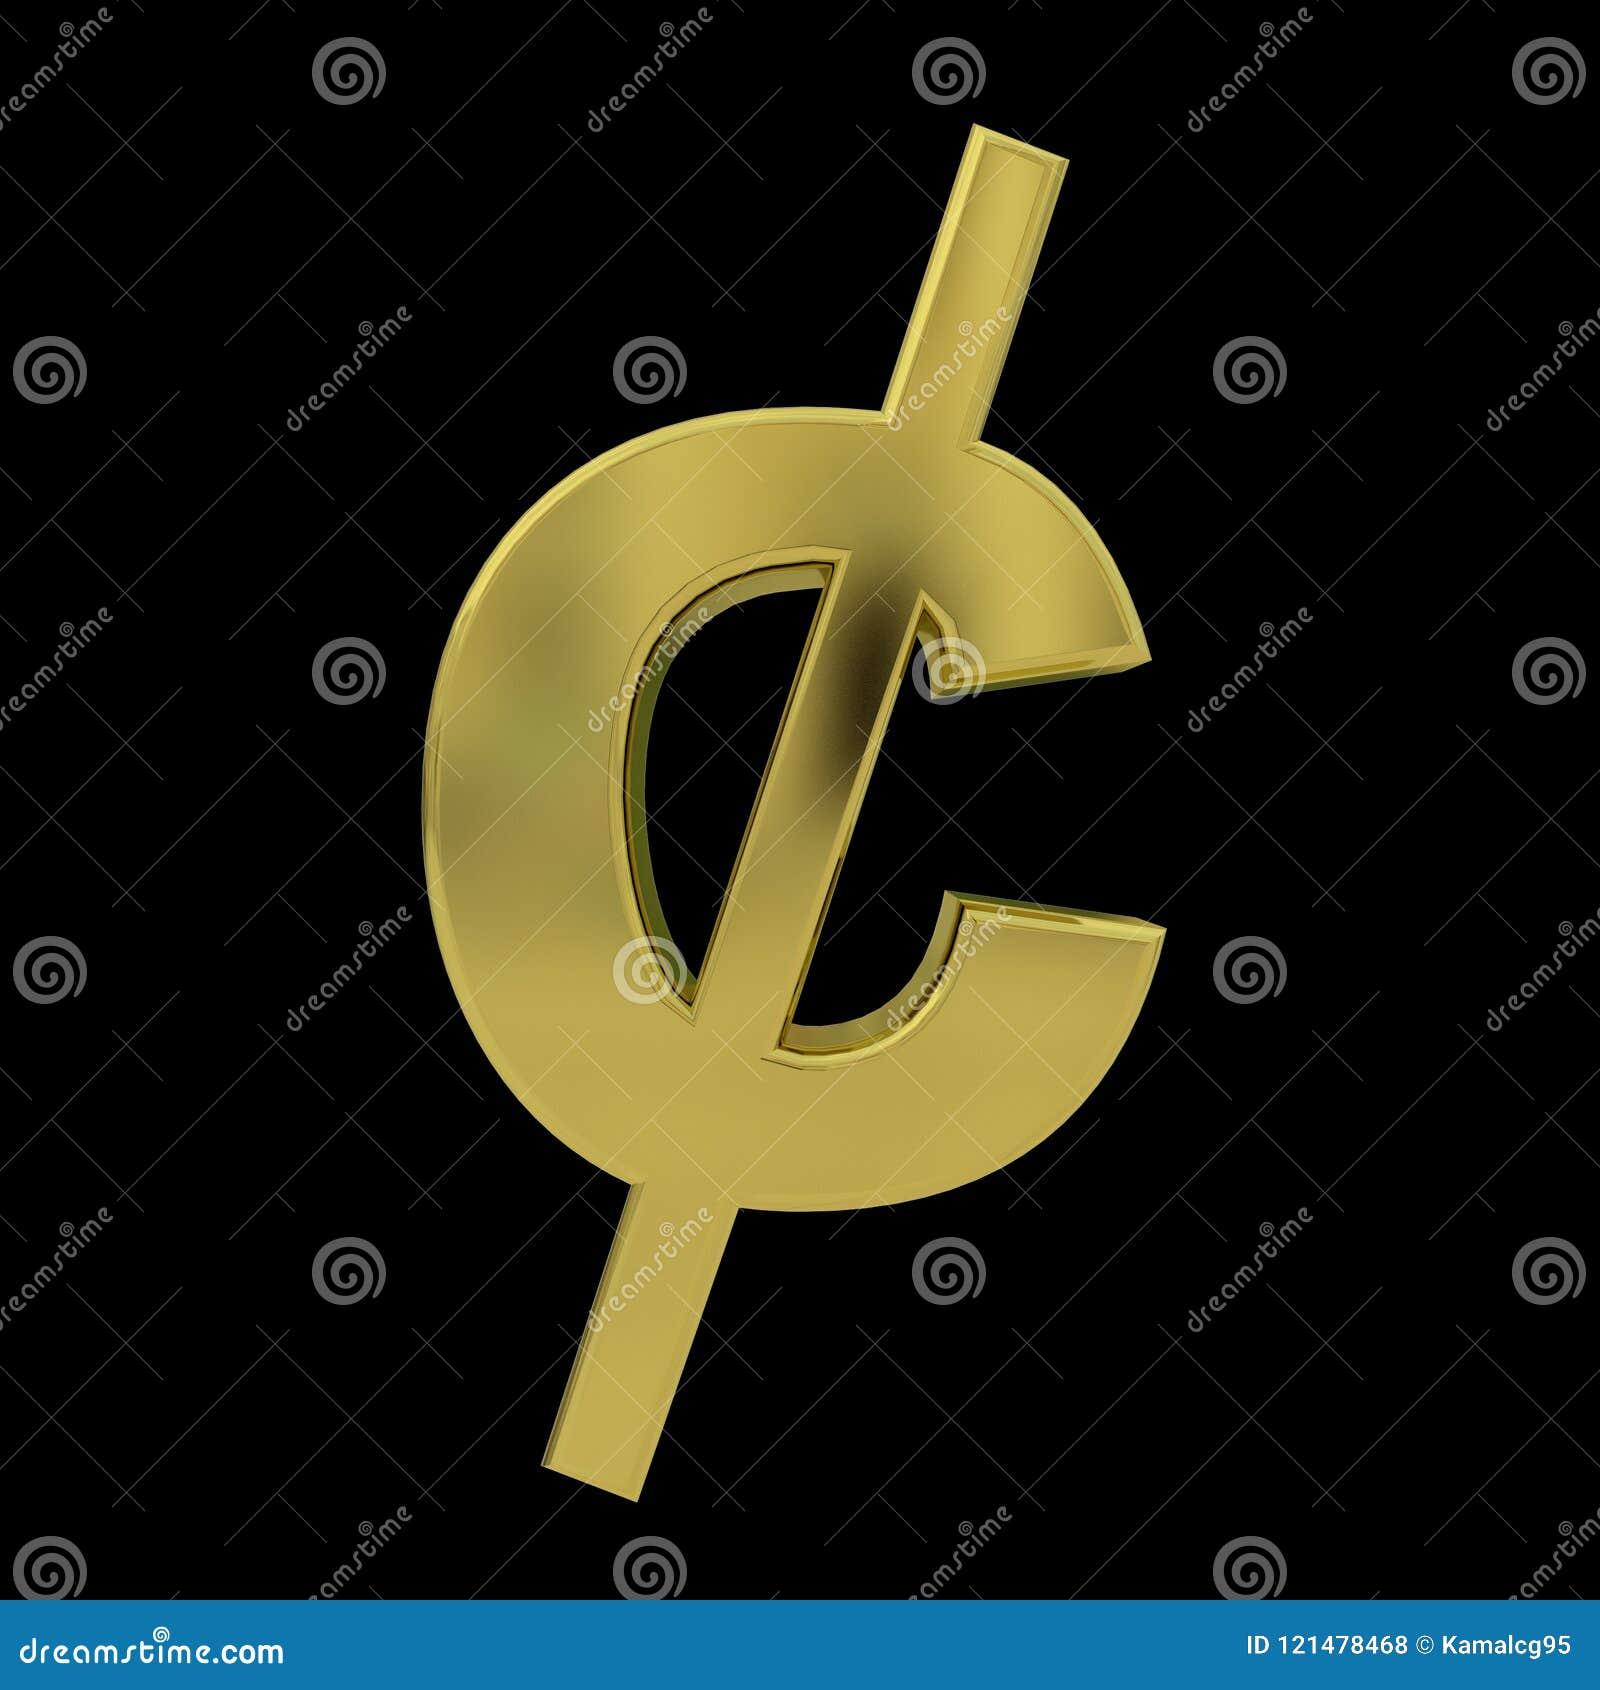 3d Golden Cent Symbol Isolated On Black Stock Illustration